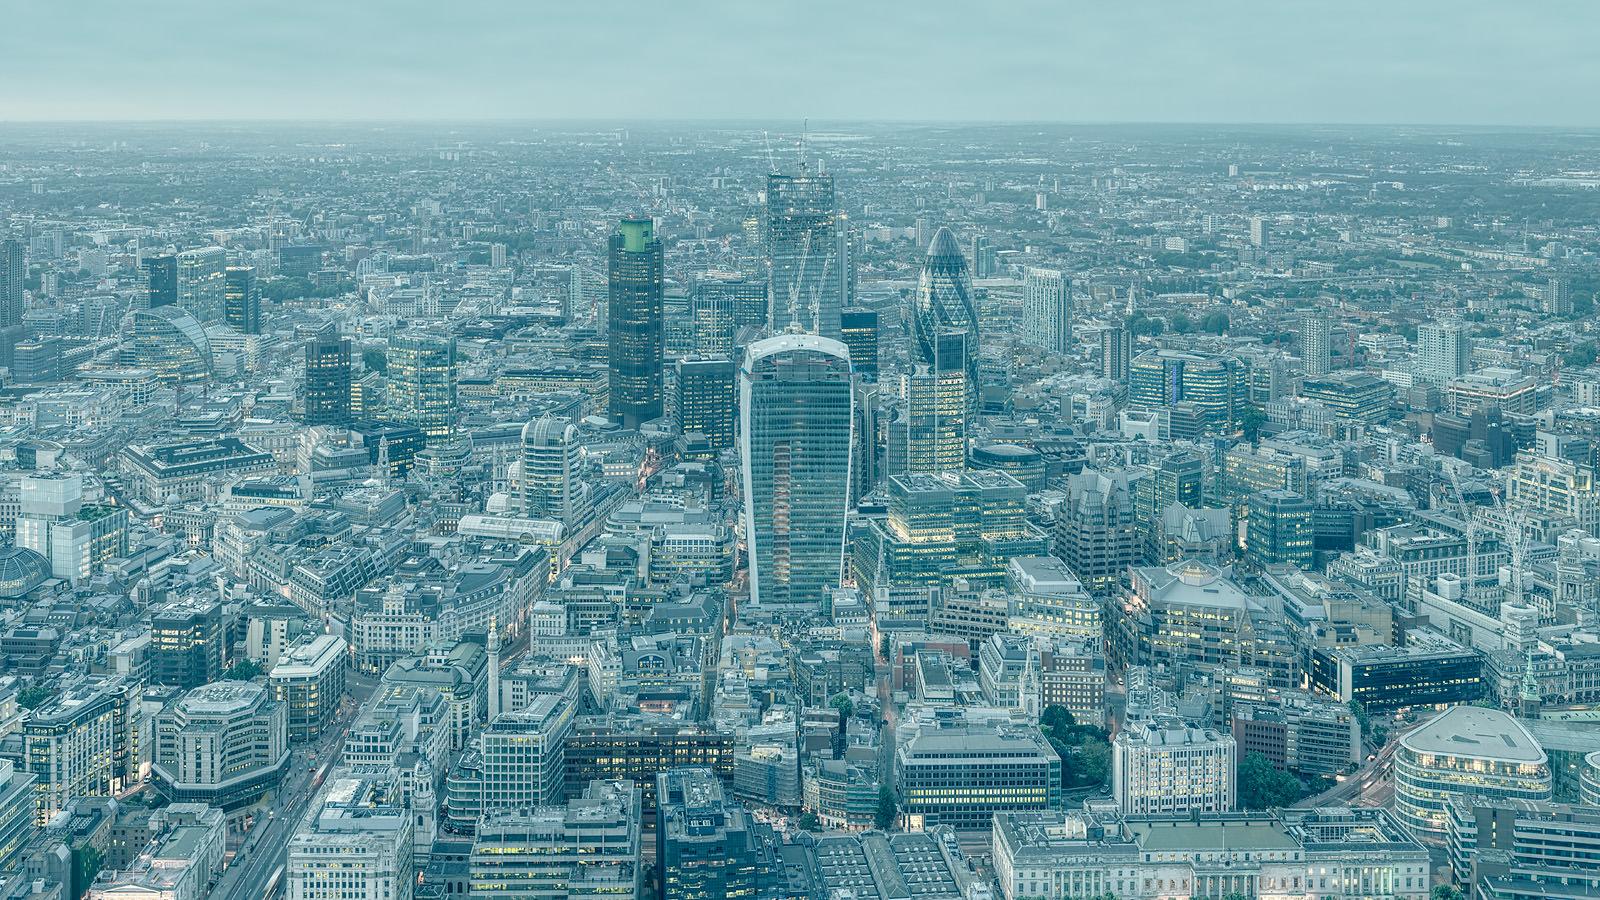 Infinitely London Acrylic - High Resolution London Cityscape Print